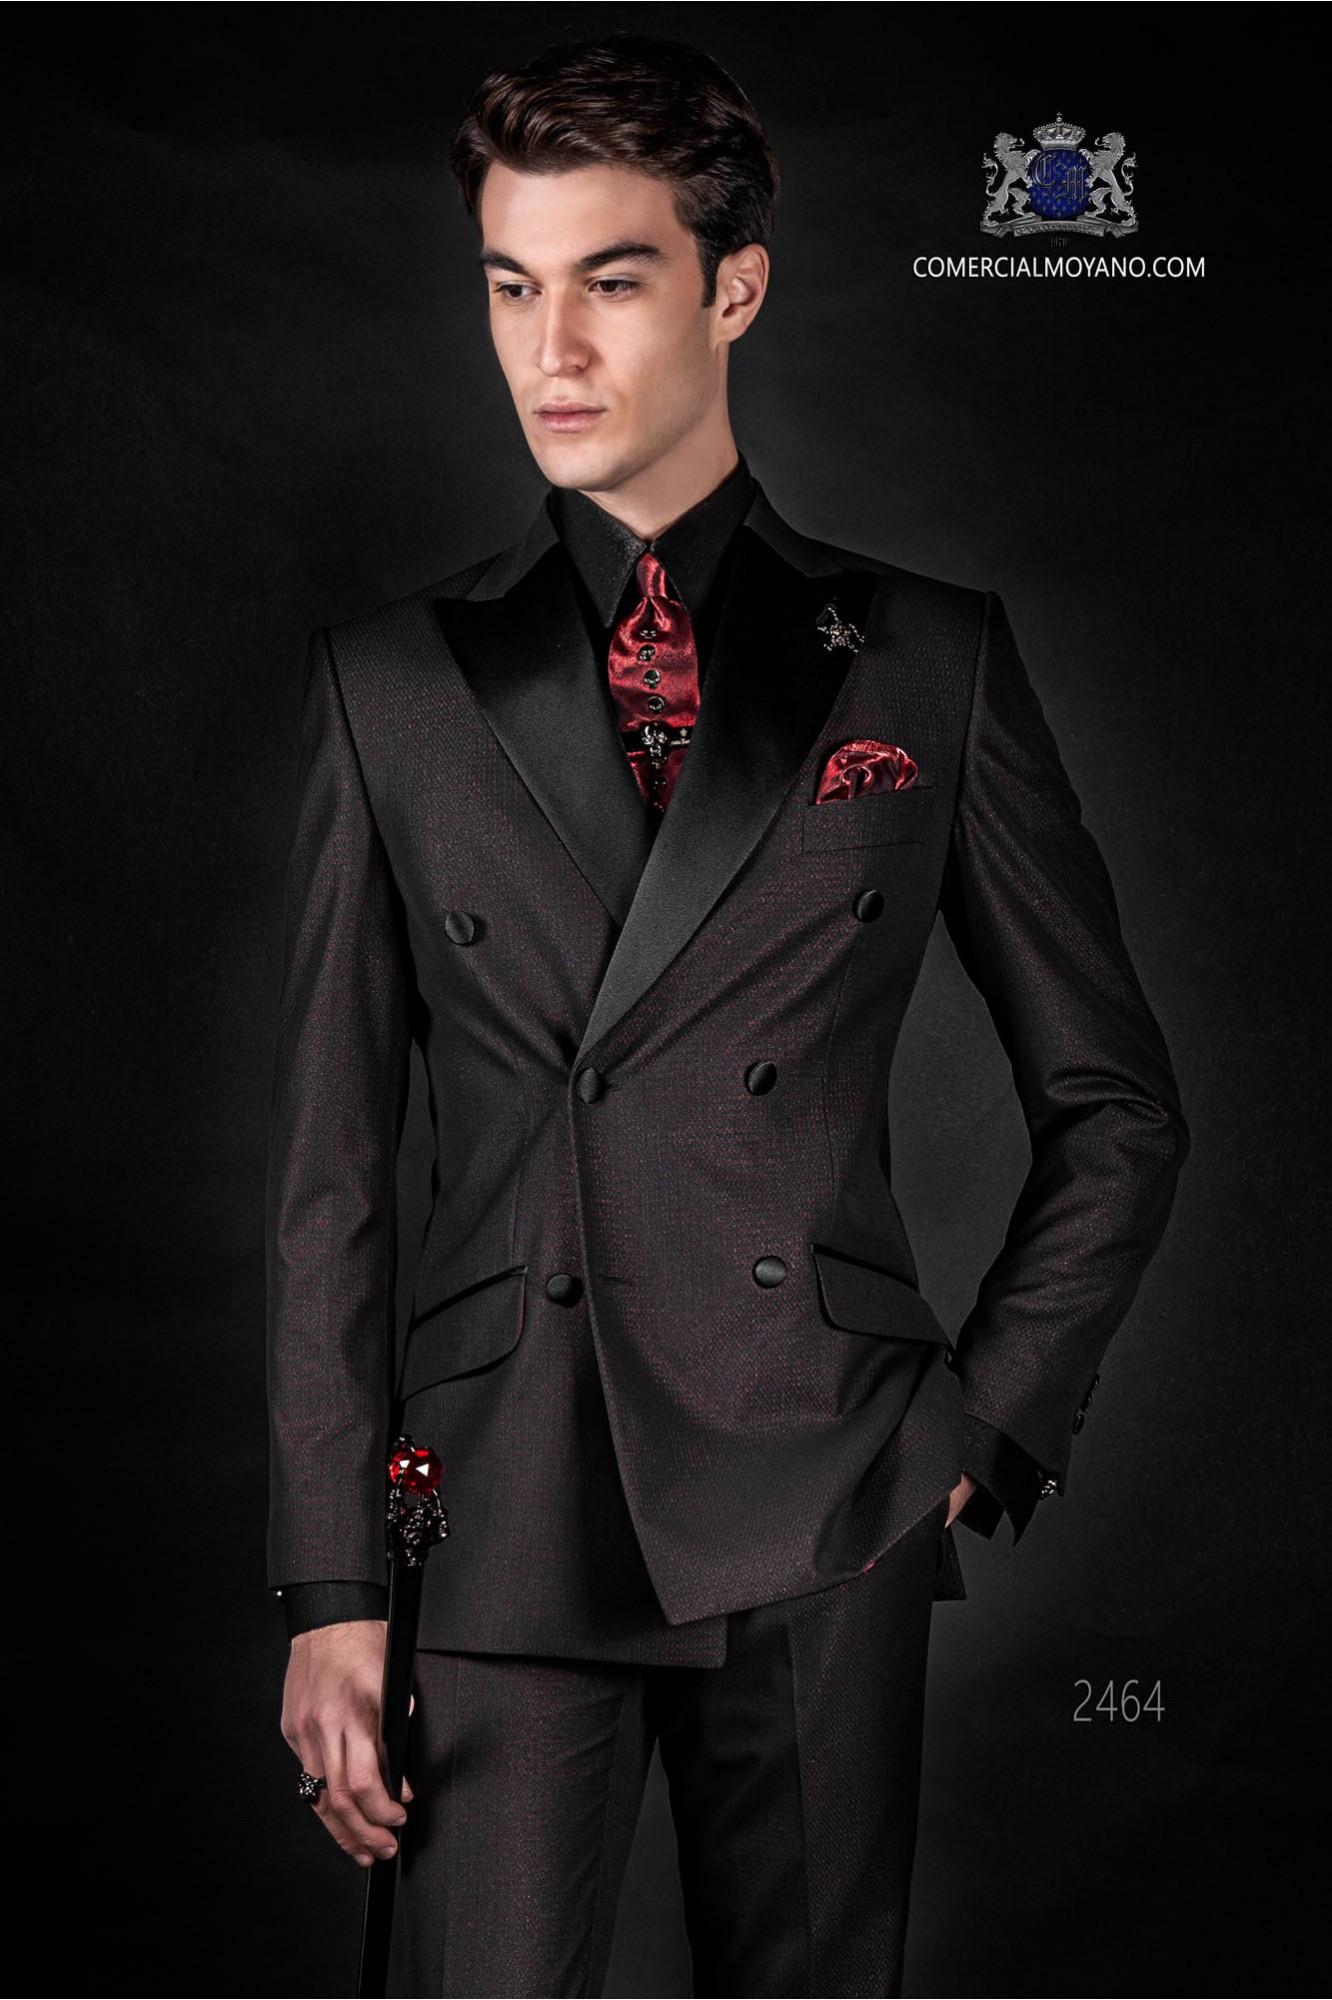 "Traje italiano de moda con moderno corte ""Slim"". Modelo cruzado de solapas punta y 6 botones. Novedoso tejido lurex"